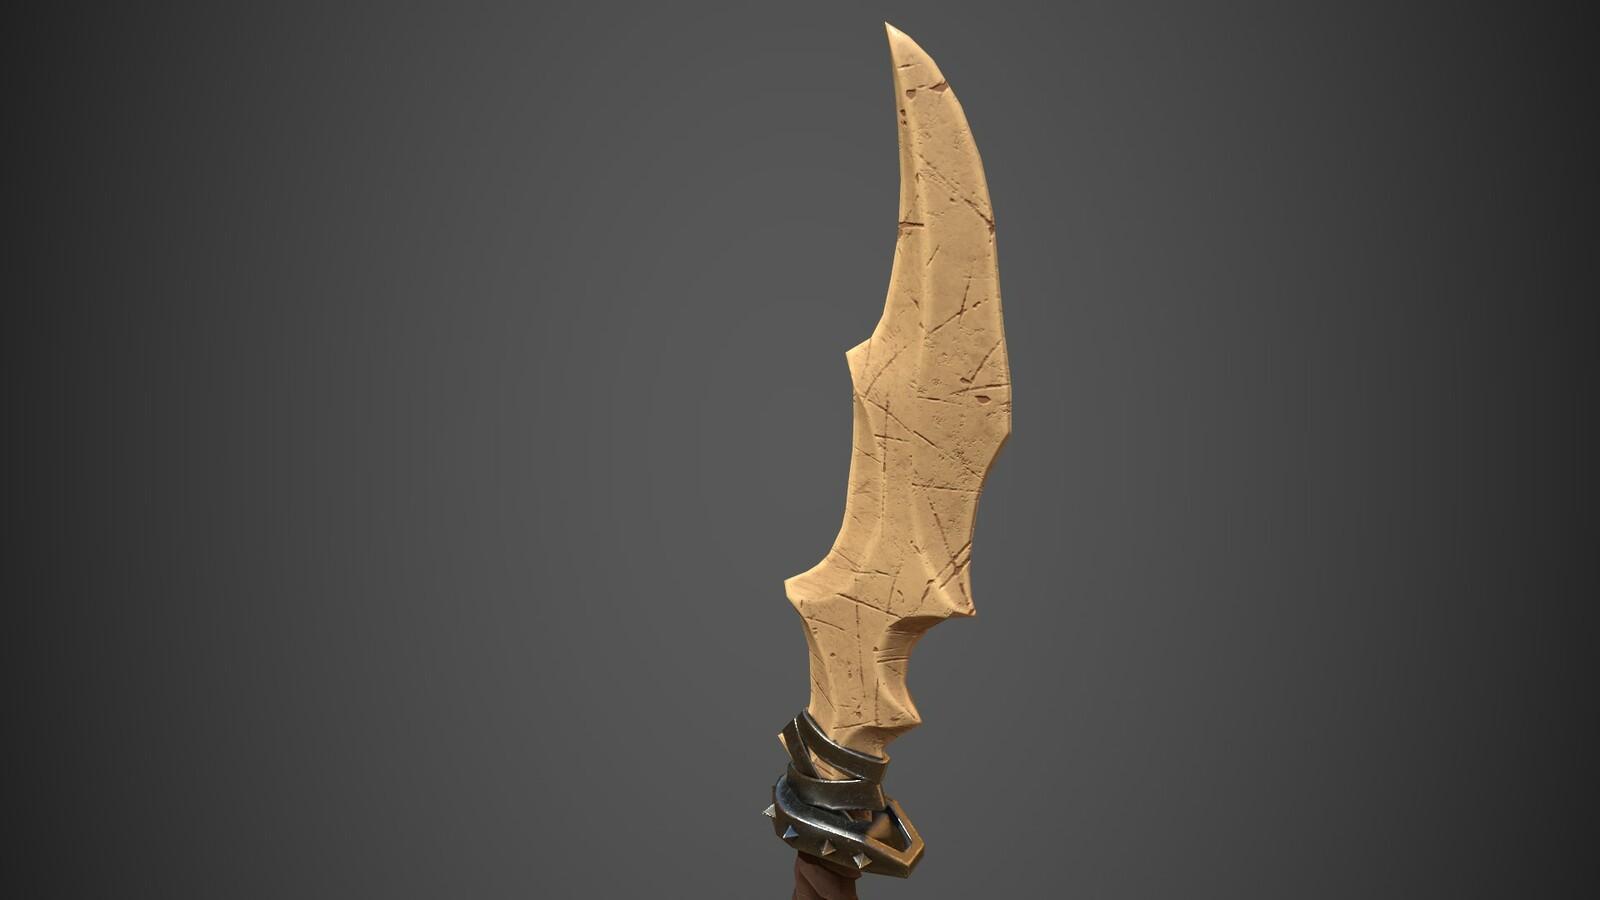 Blade Render